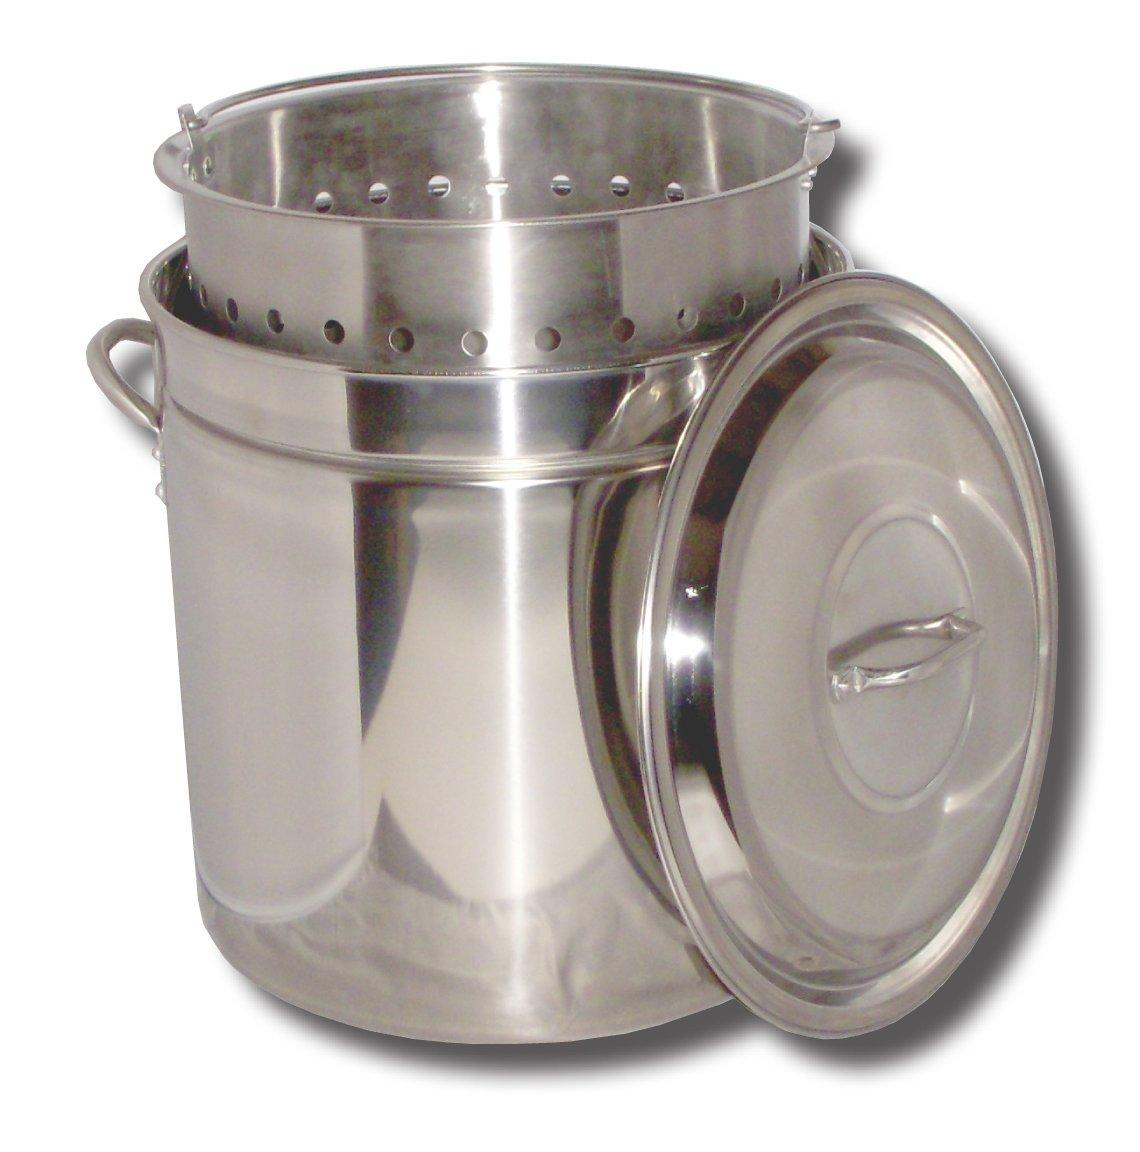 Metal Fusion KK36SR 36QT Stainless Steel Pot/Basket